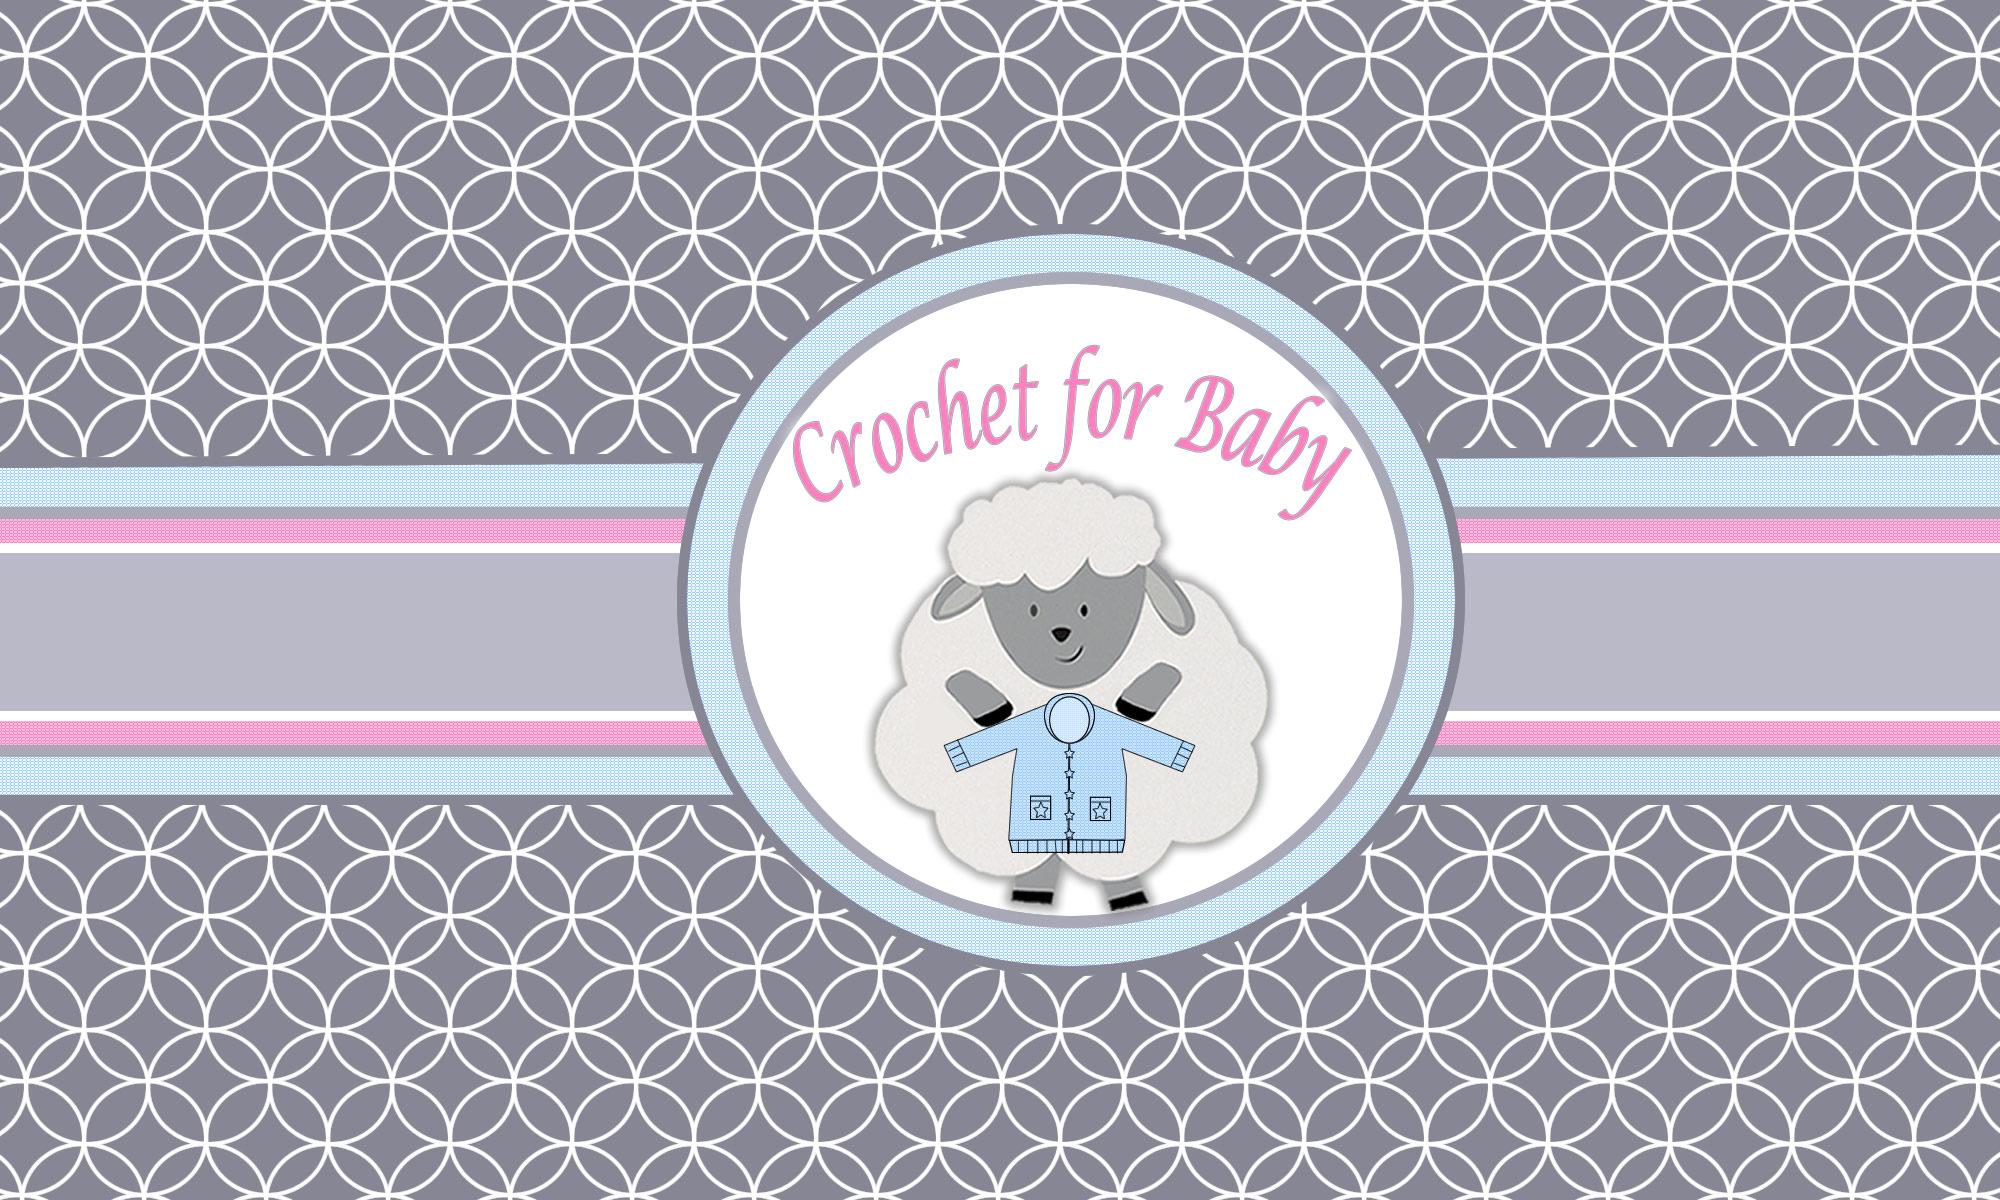 crochetforbaby.com